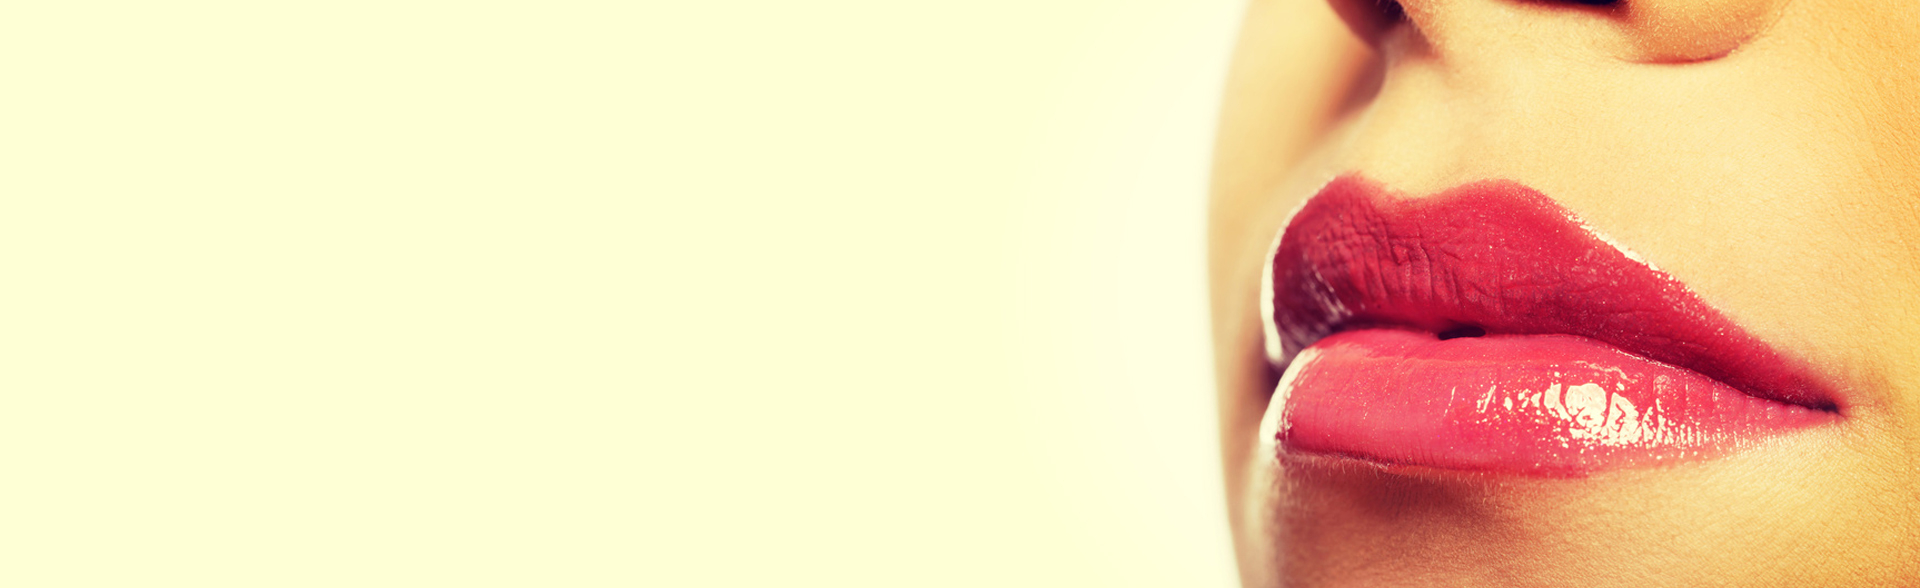 Modelowanie ust beauty center